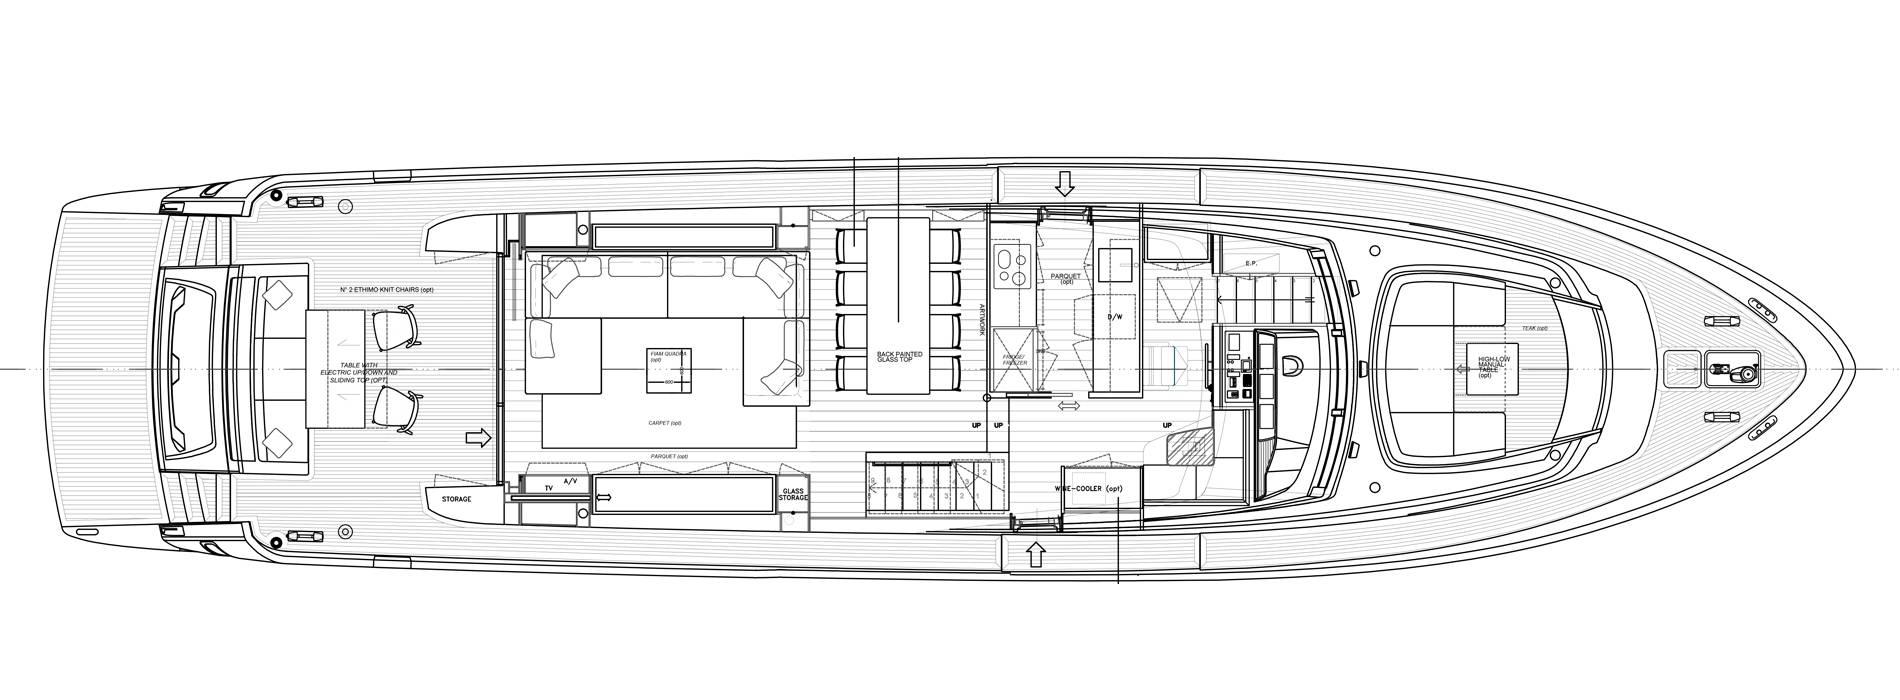 Sanlorenzo Yachts SL78-695 Cubierta principal